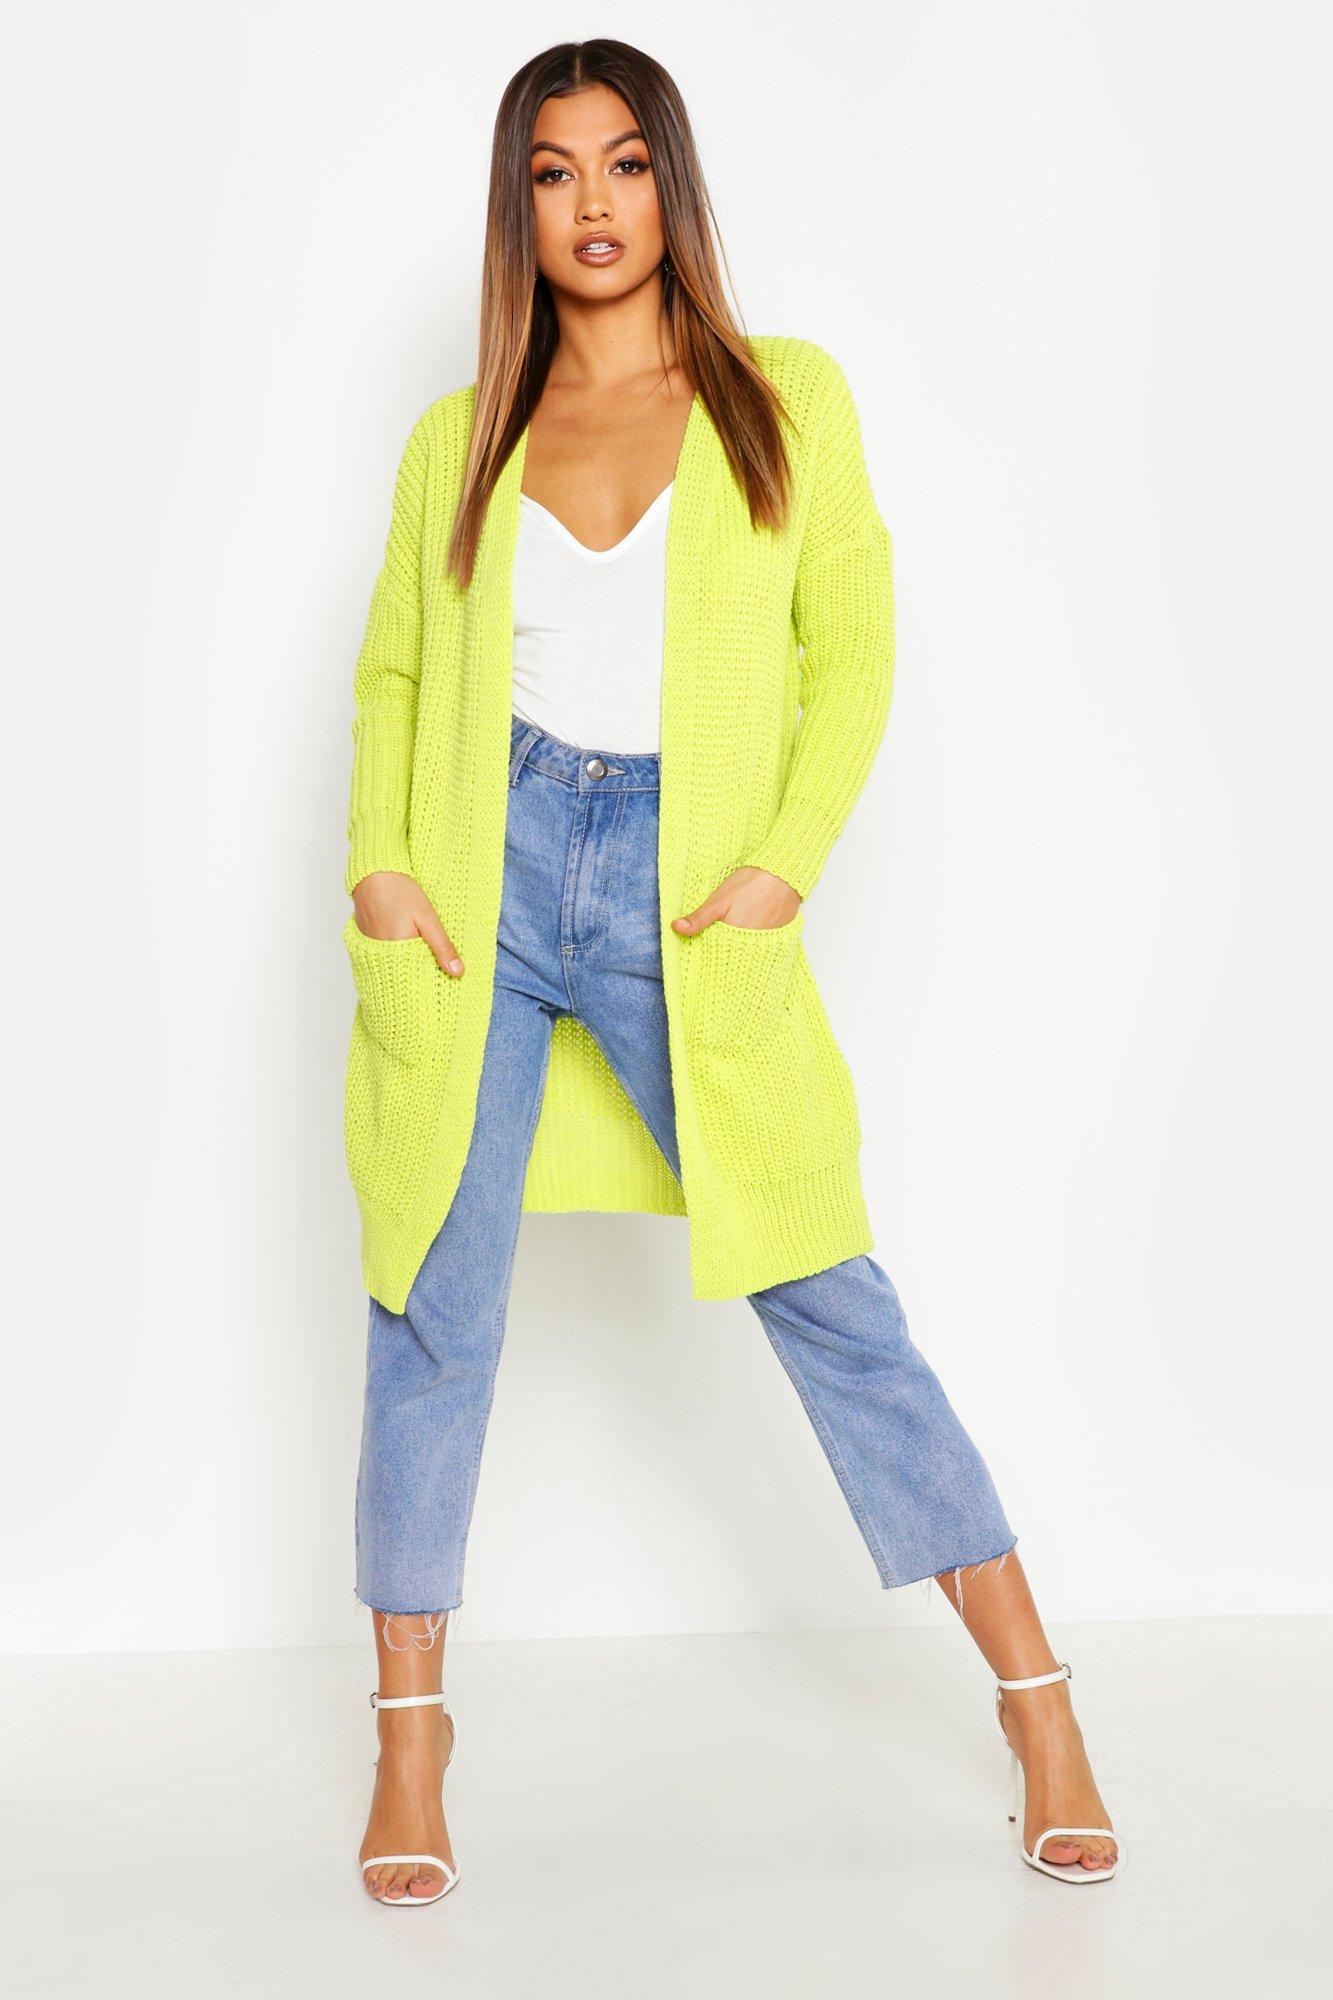 Womens Übergroßer Boyfriend-Cardigan - lime - S/M, Lime - Boohoo.com